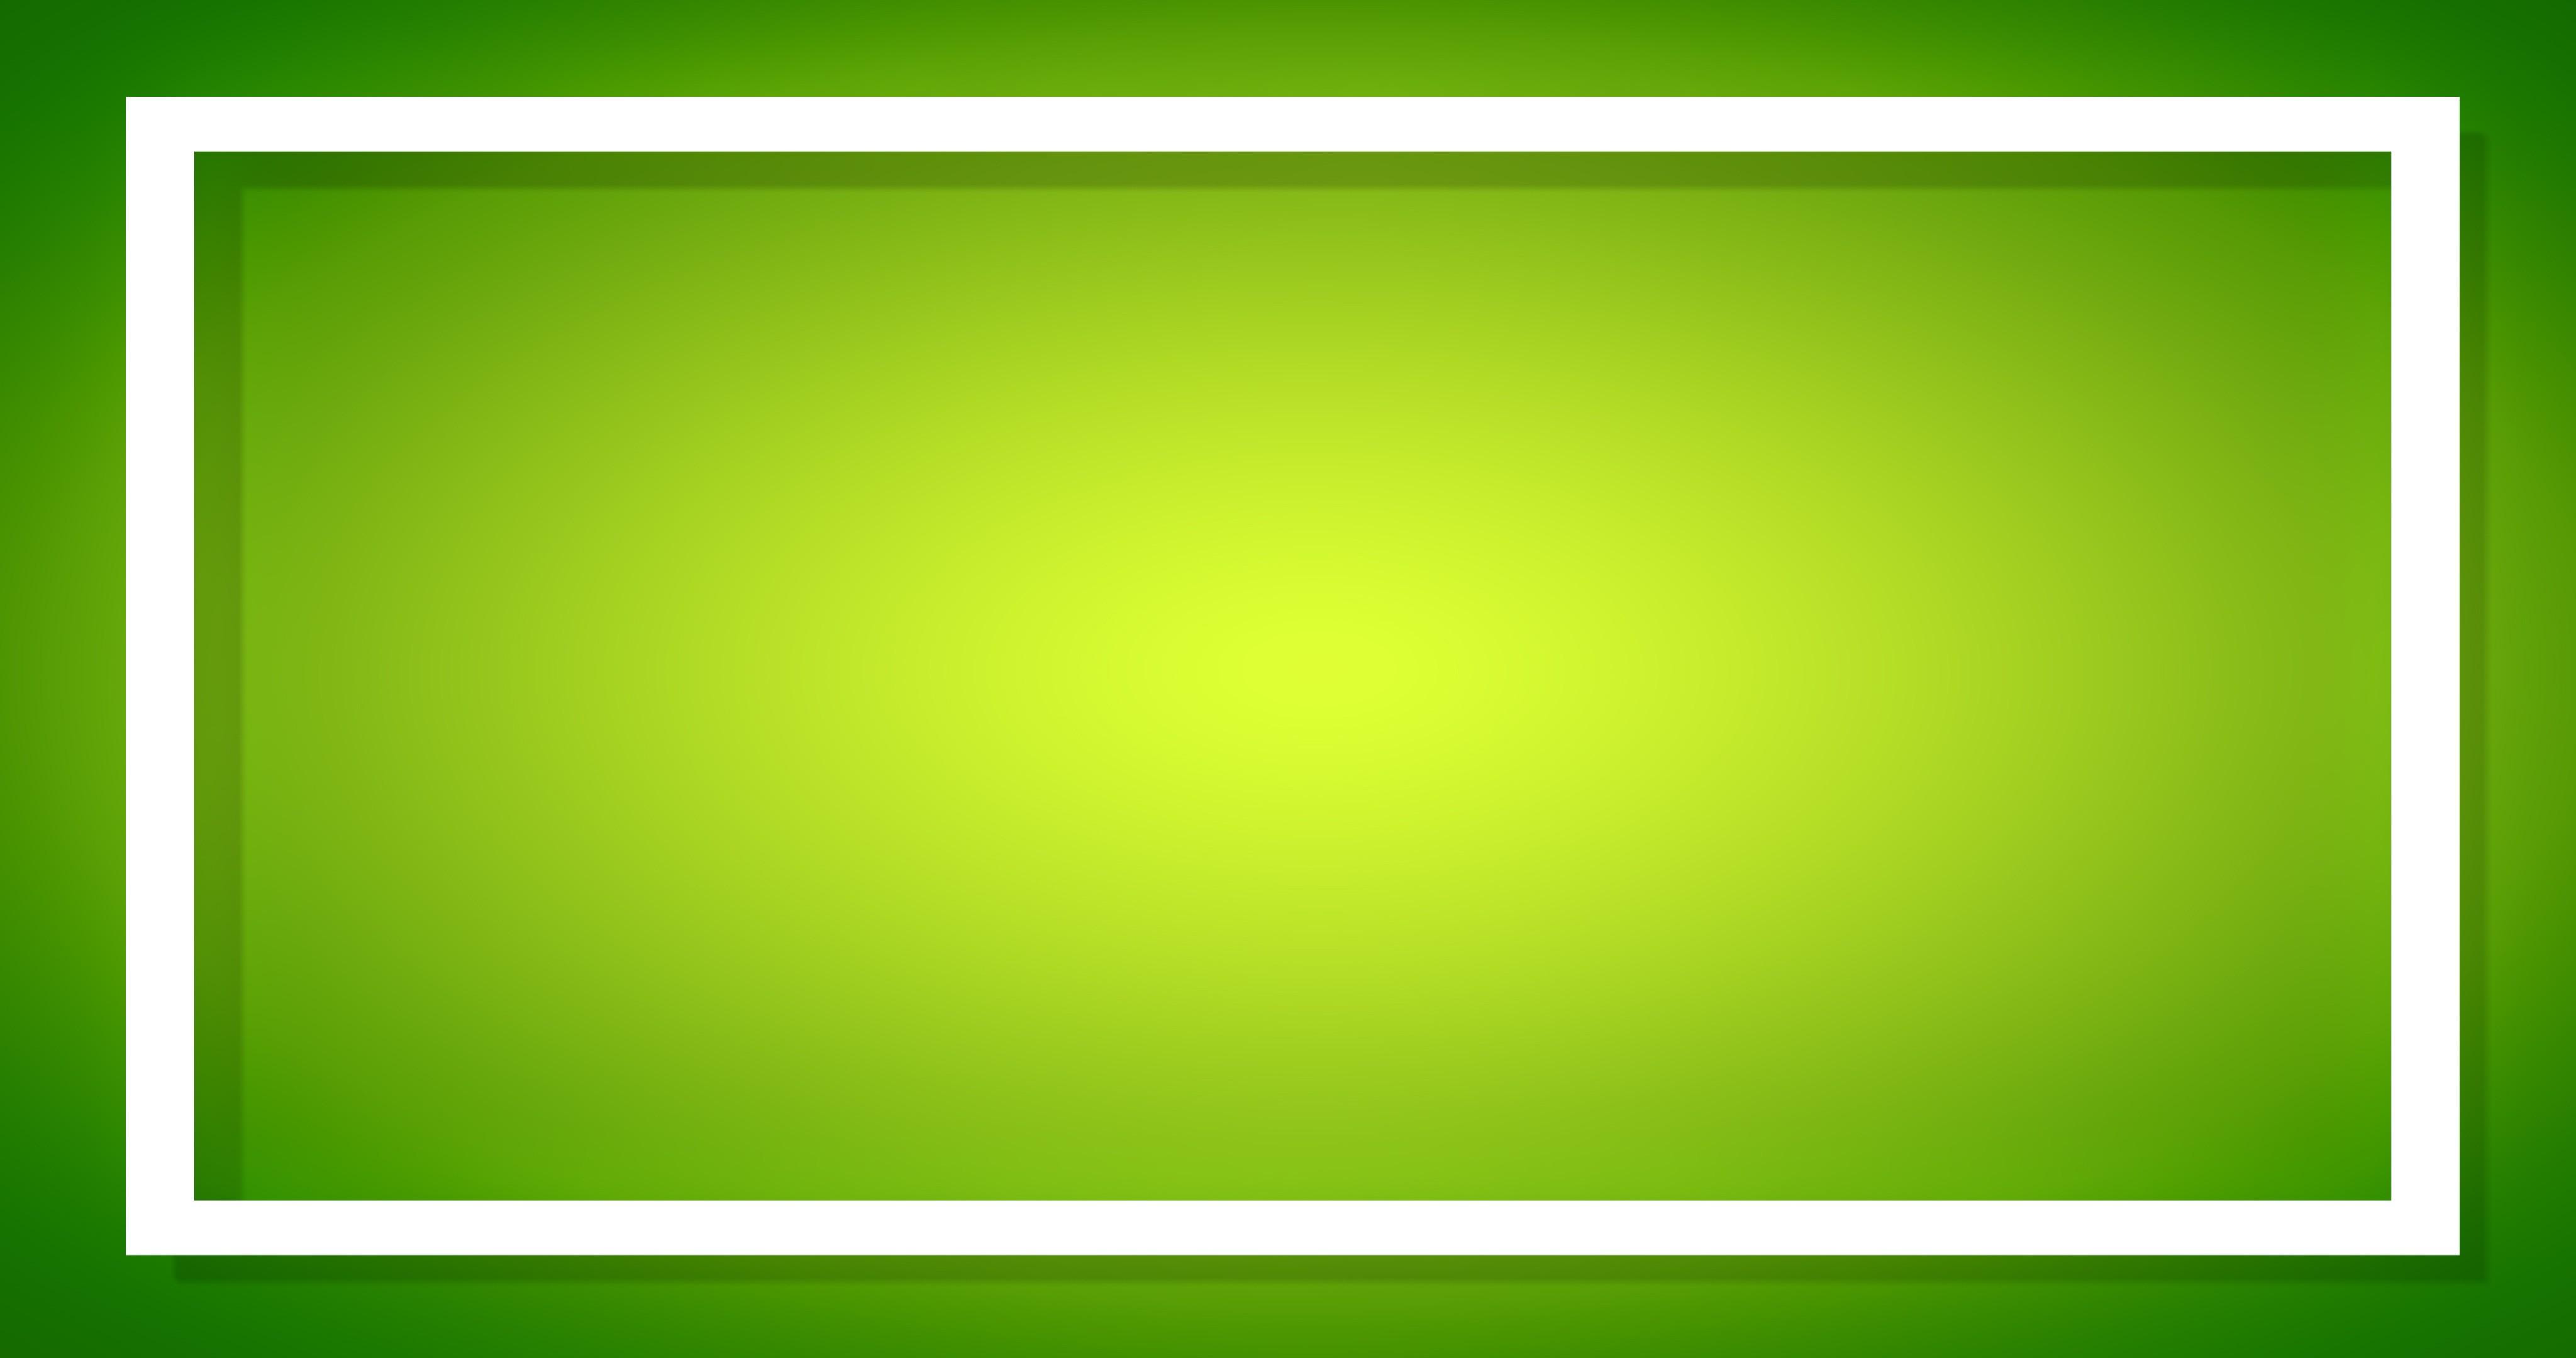 Green Background 30 - [4096x2160]